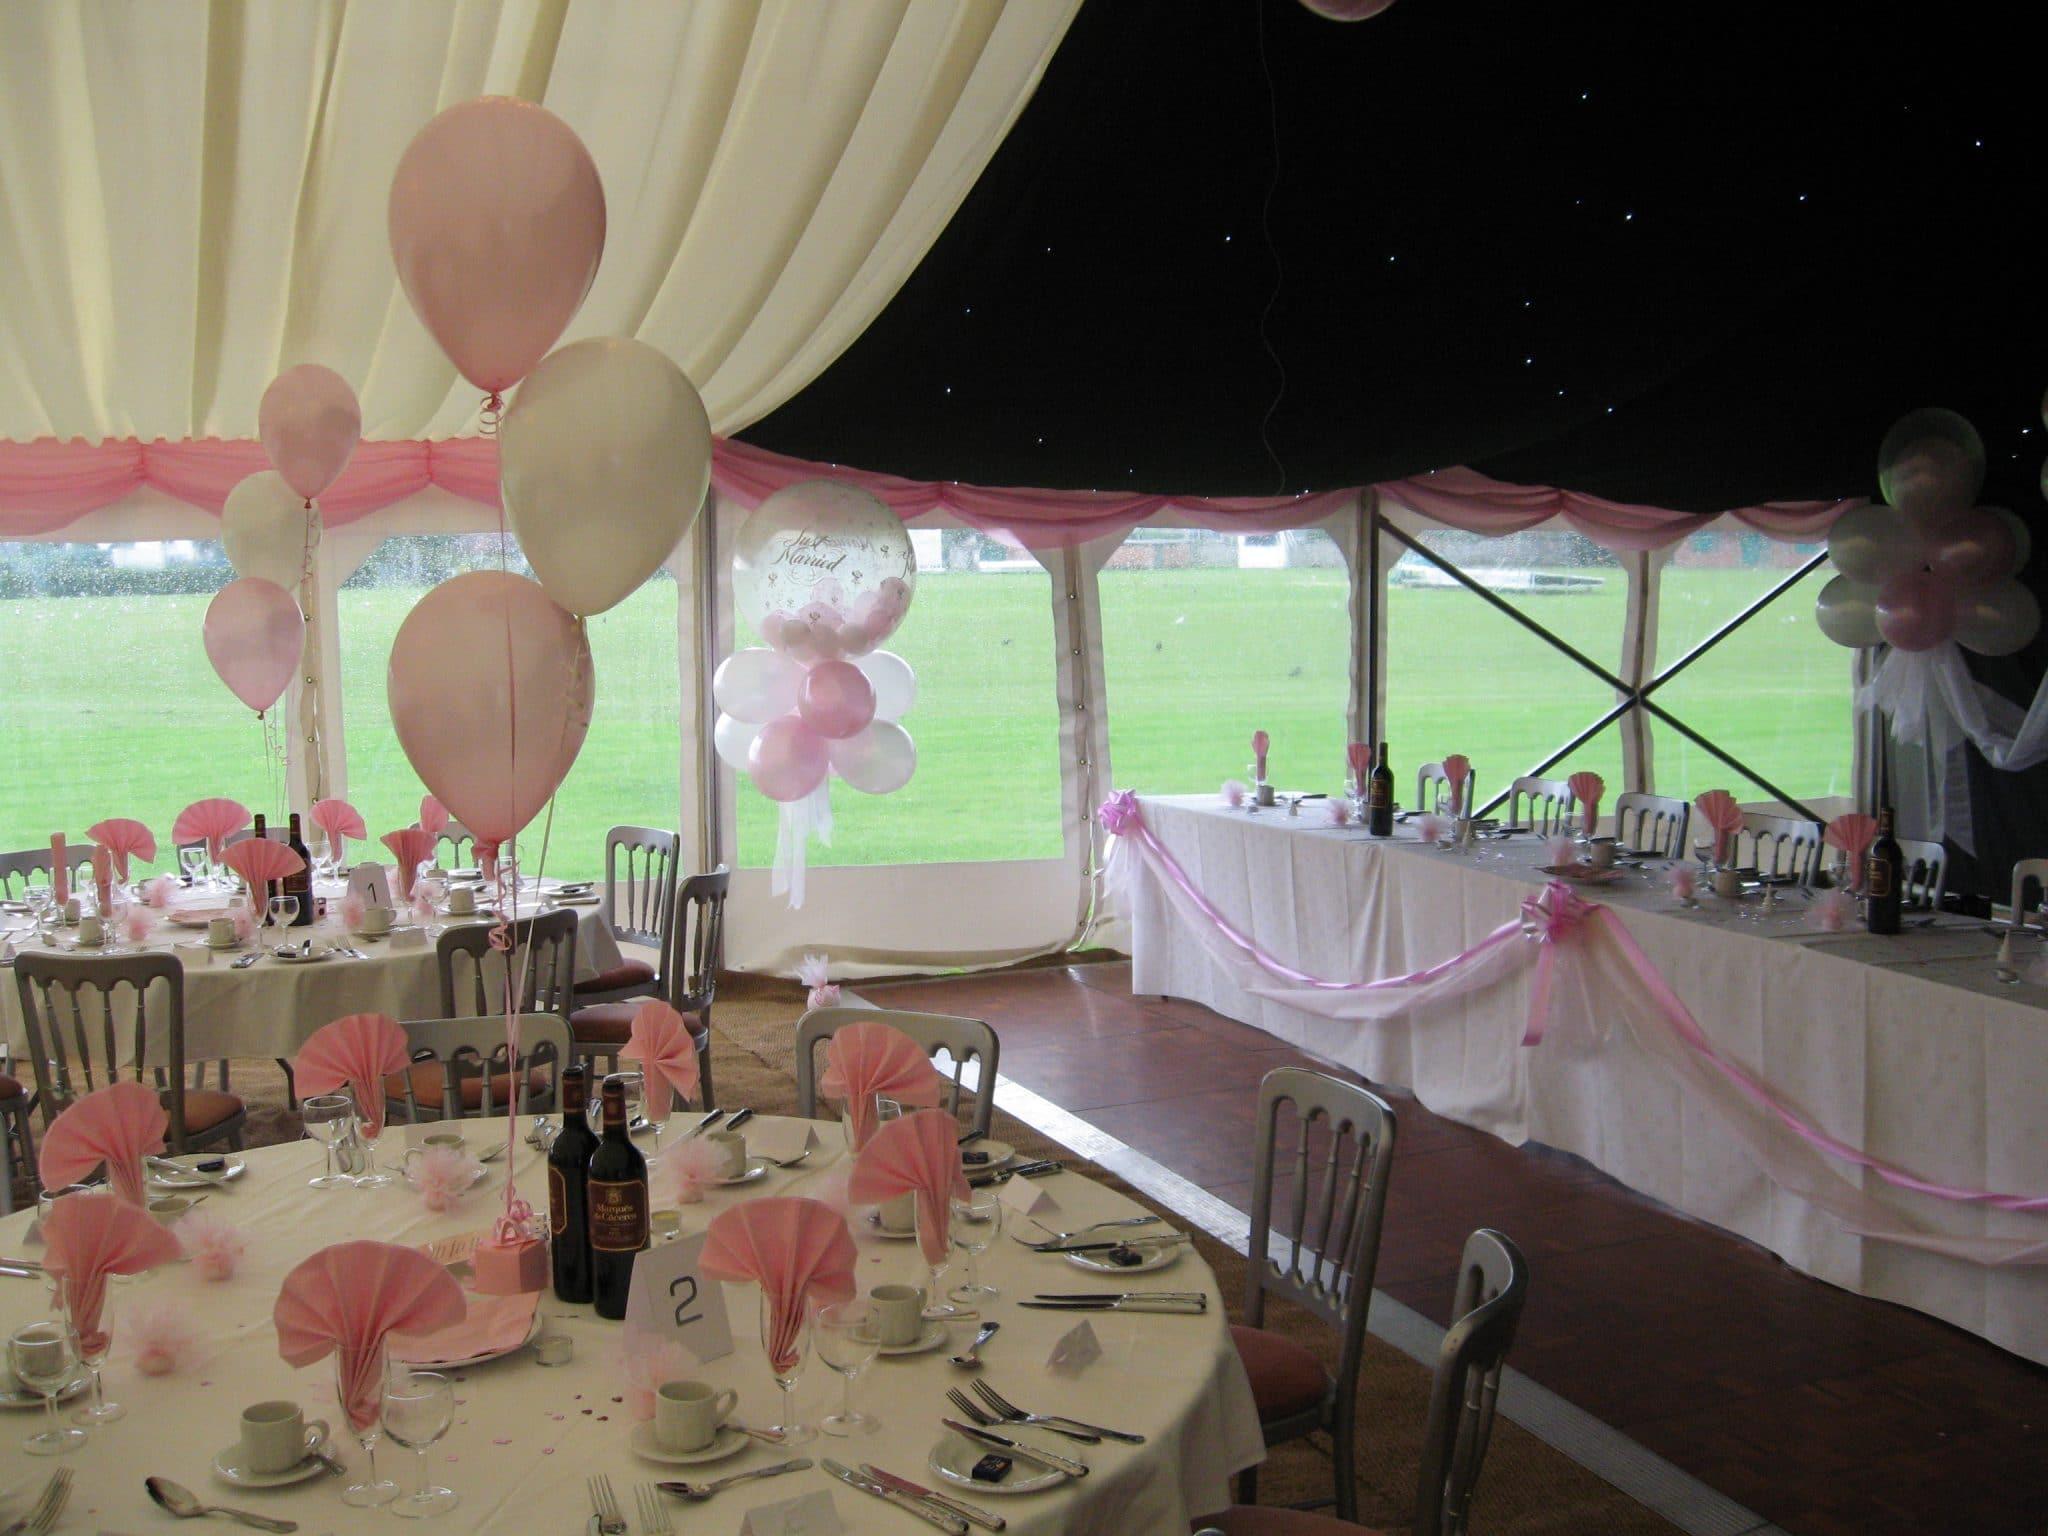 Cardiff Balloon decorate Penarth Athletic Club